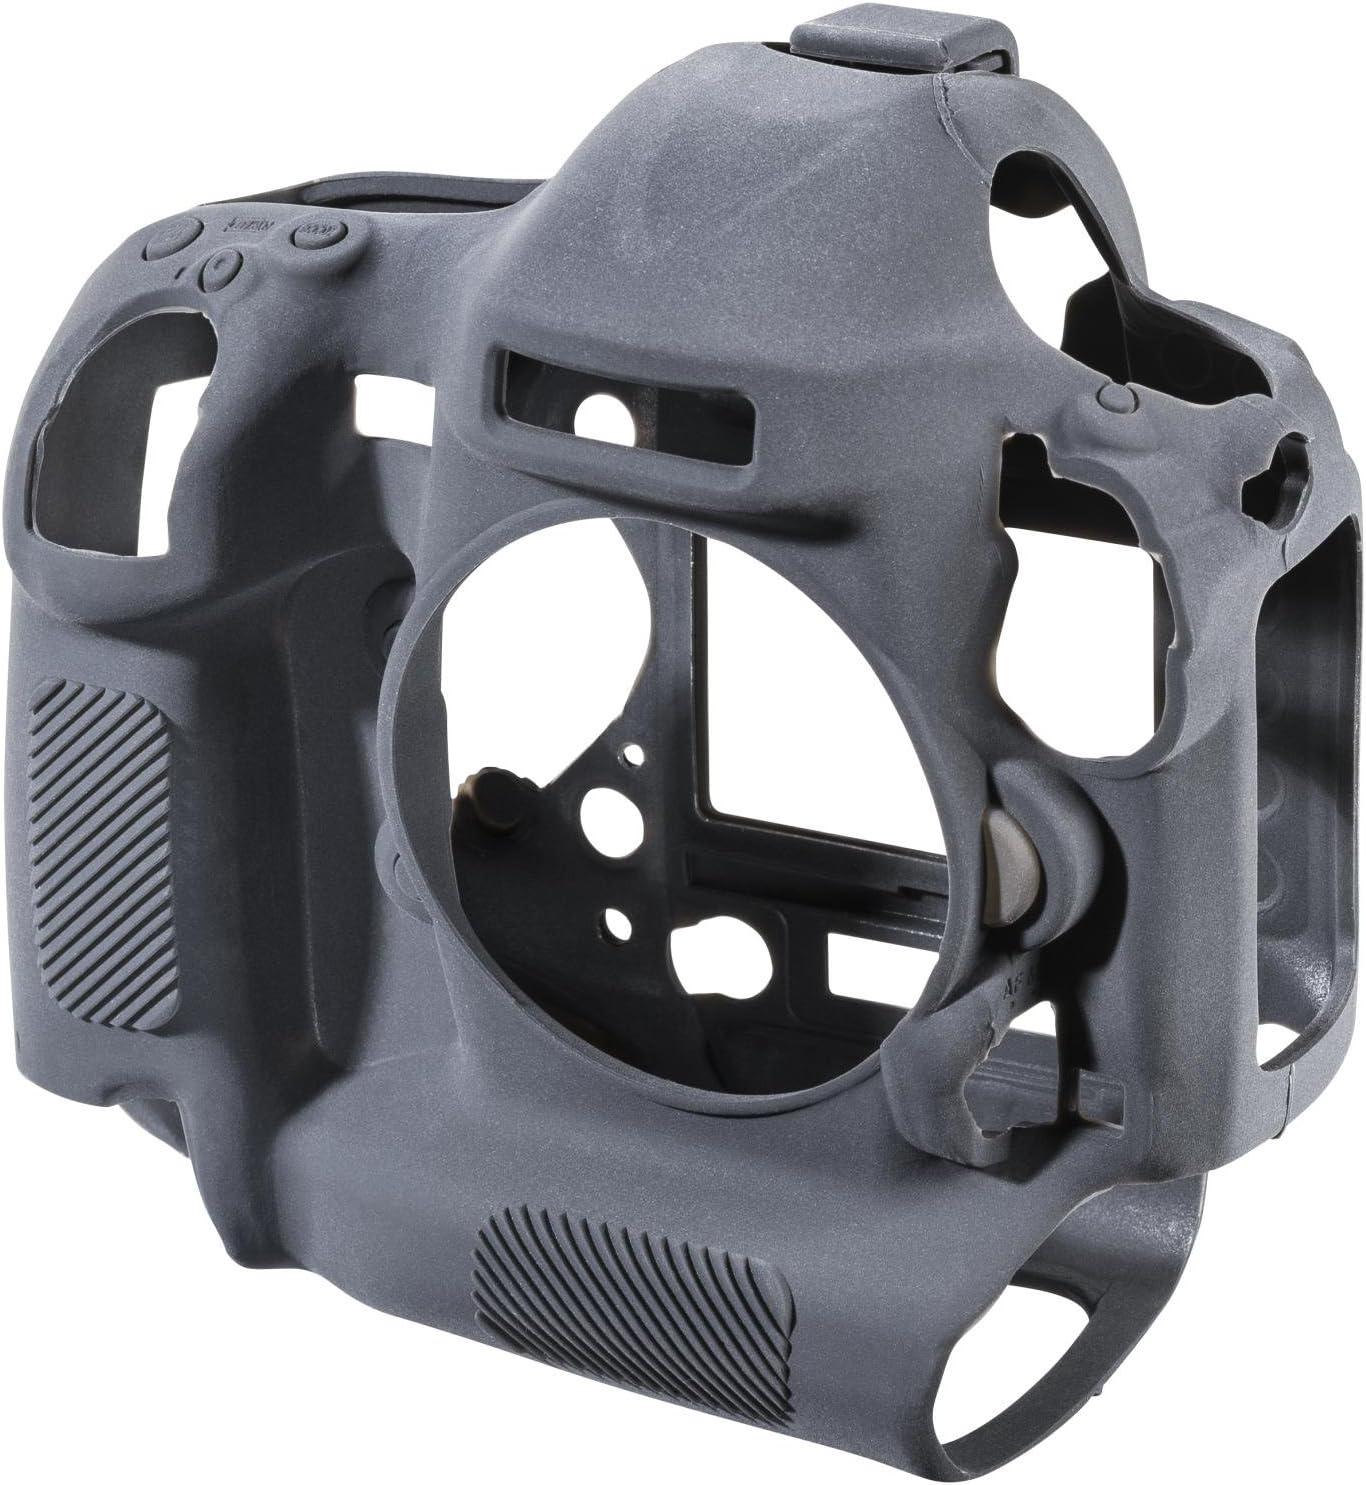 Walimex Pro Easycover Kamera Schutzhülle Für Nikon D4s Kamera